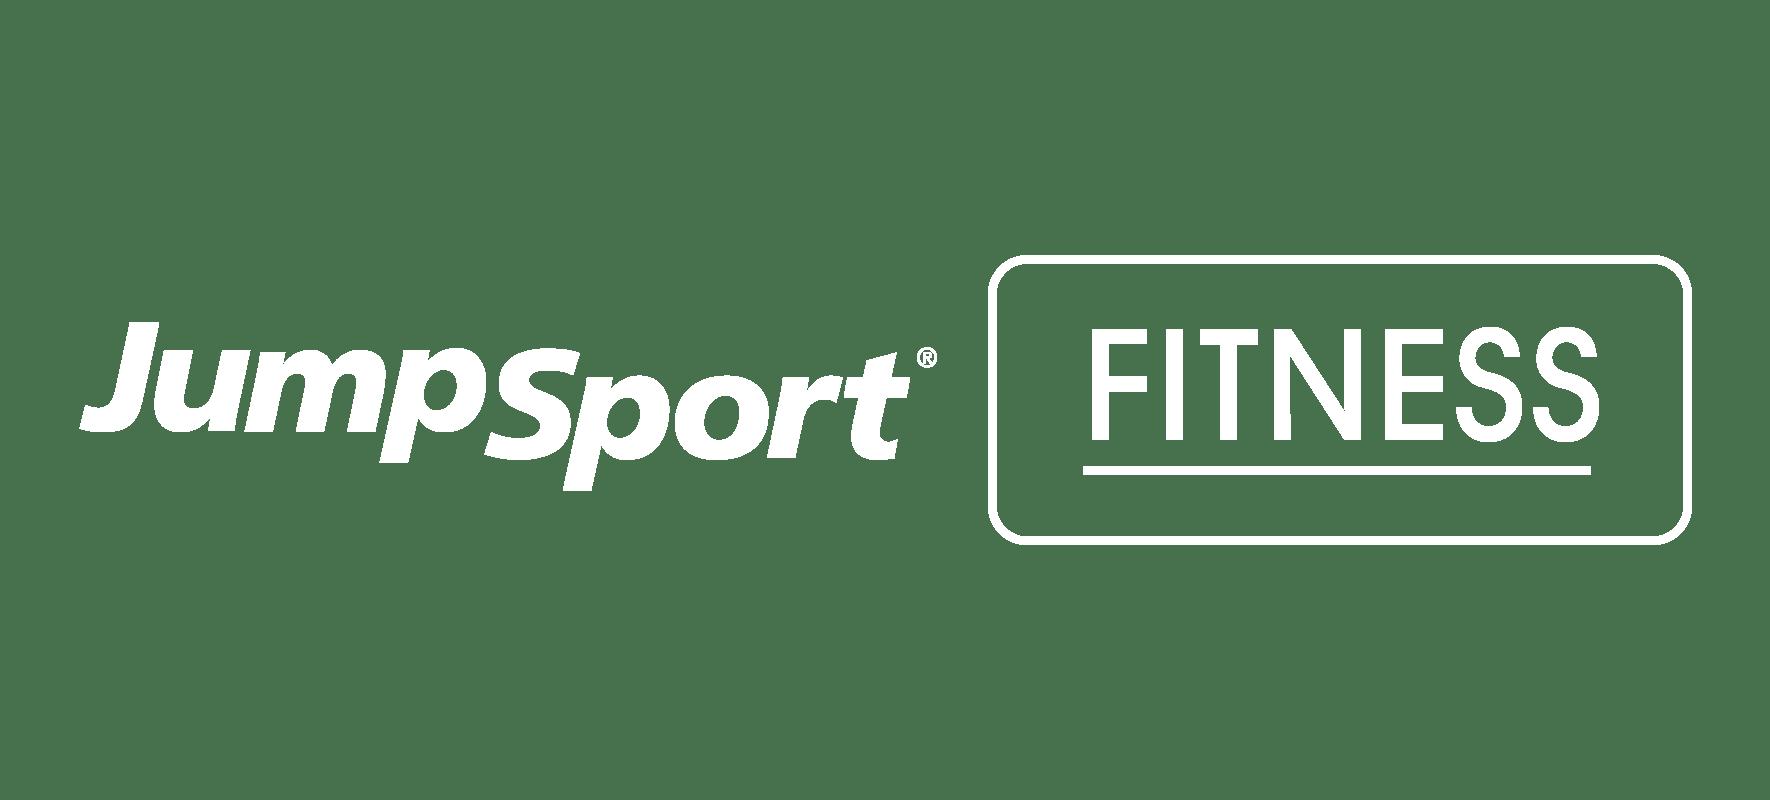 JumpSport Fitness Logo